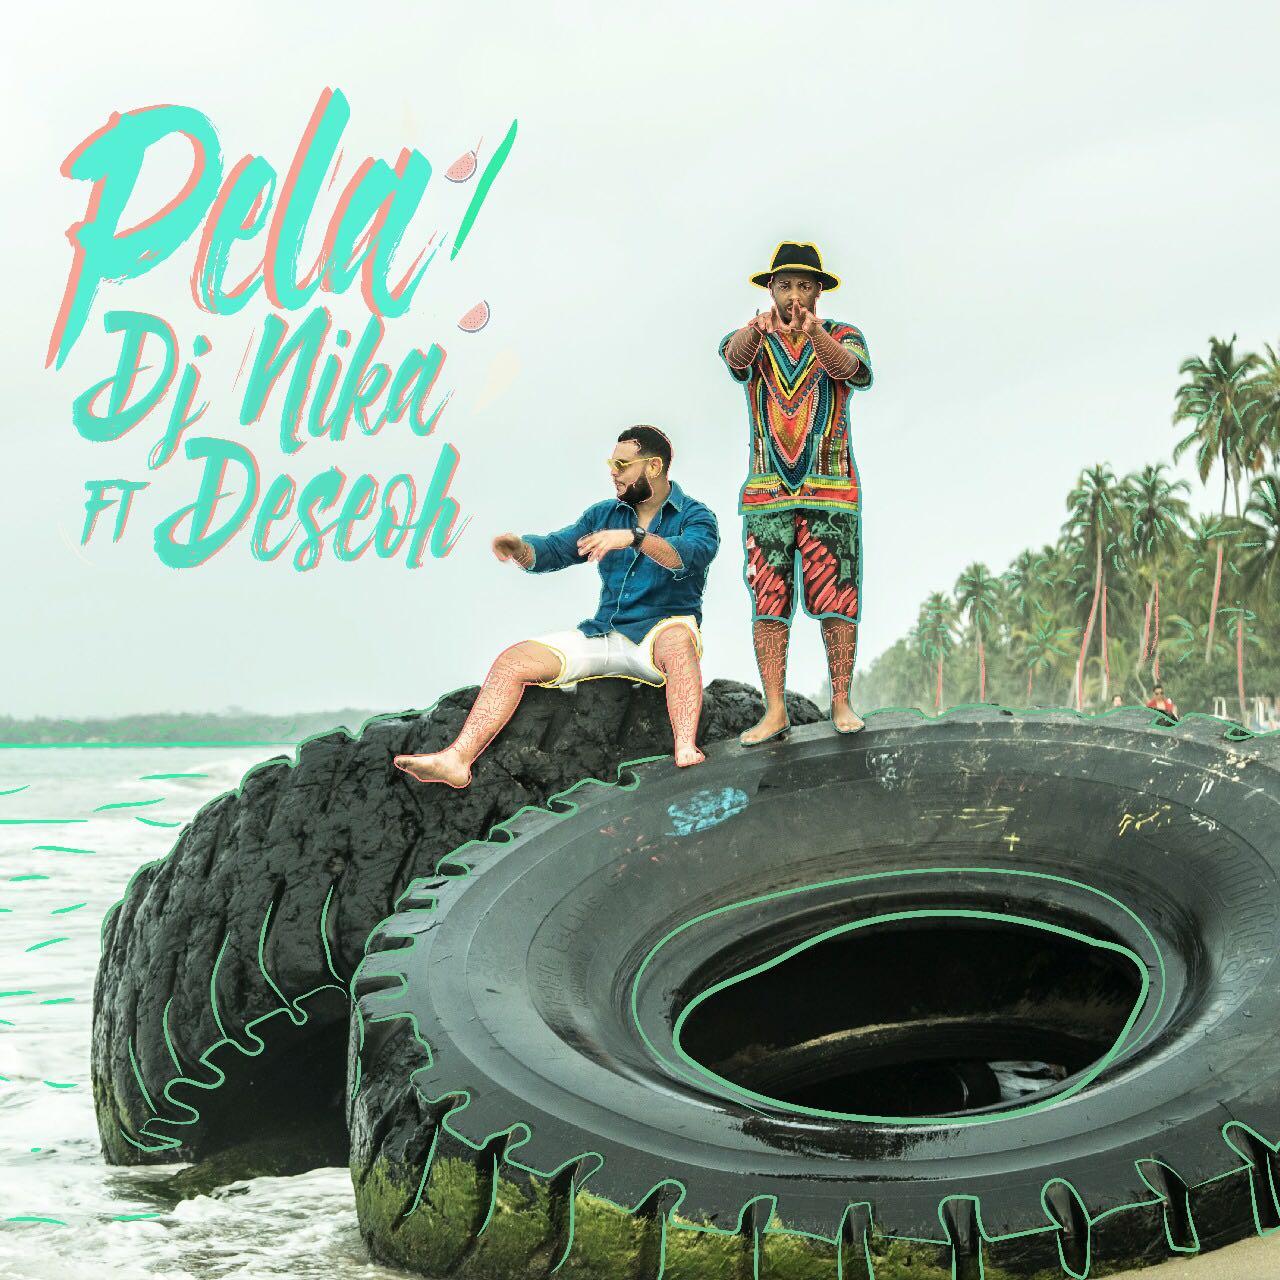 DJ Nika Feat. Deseoh - Pela